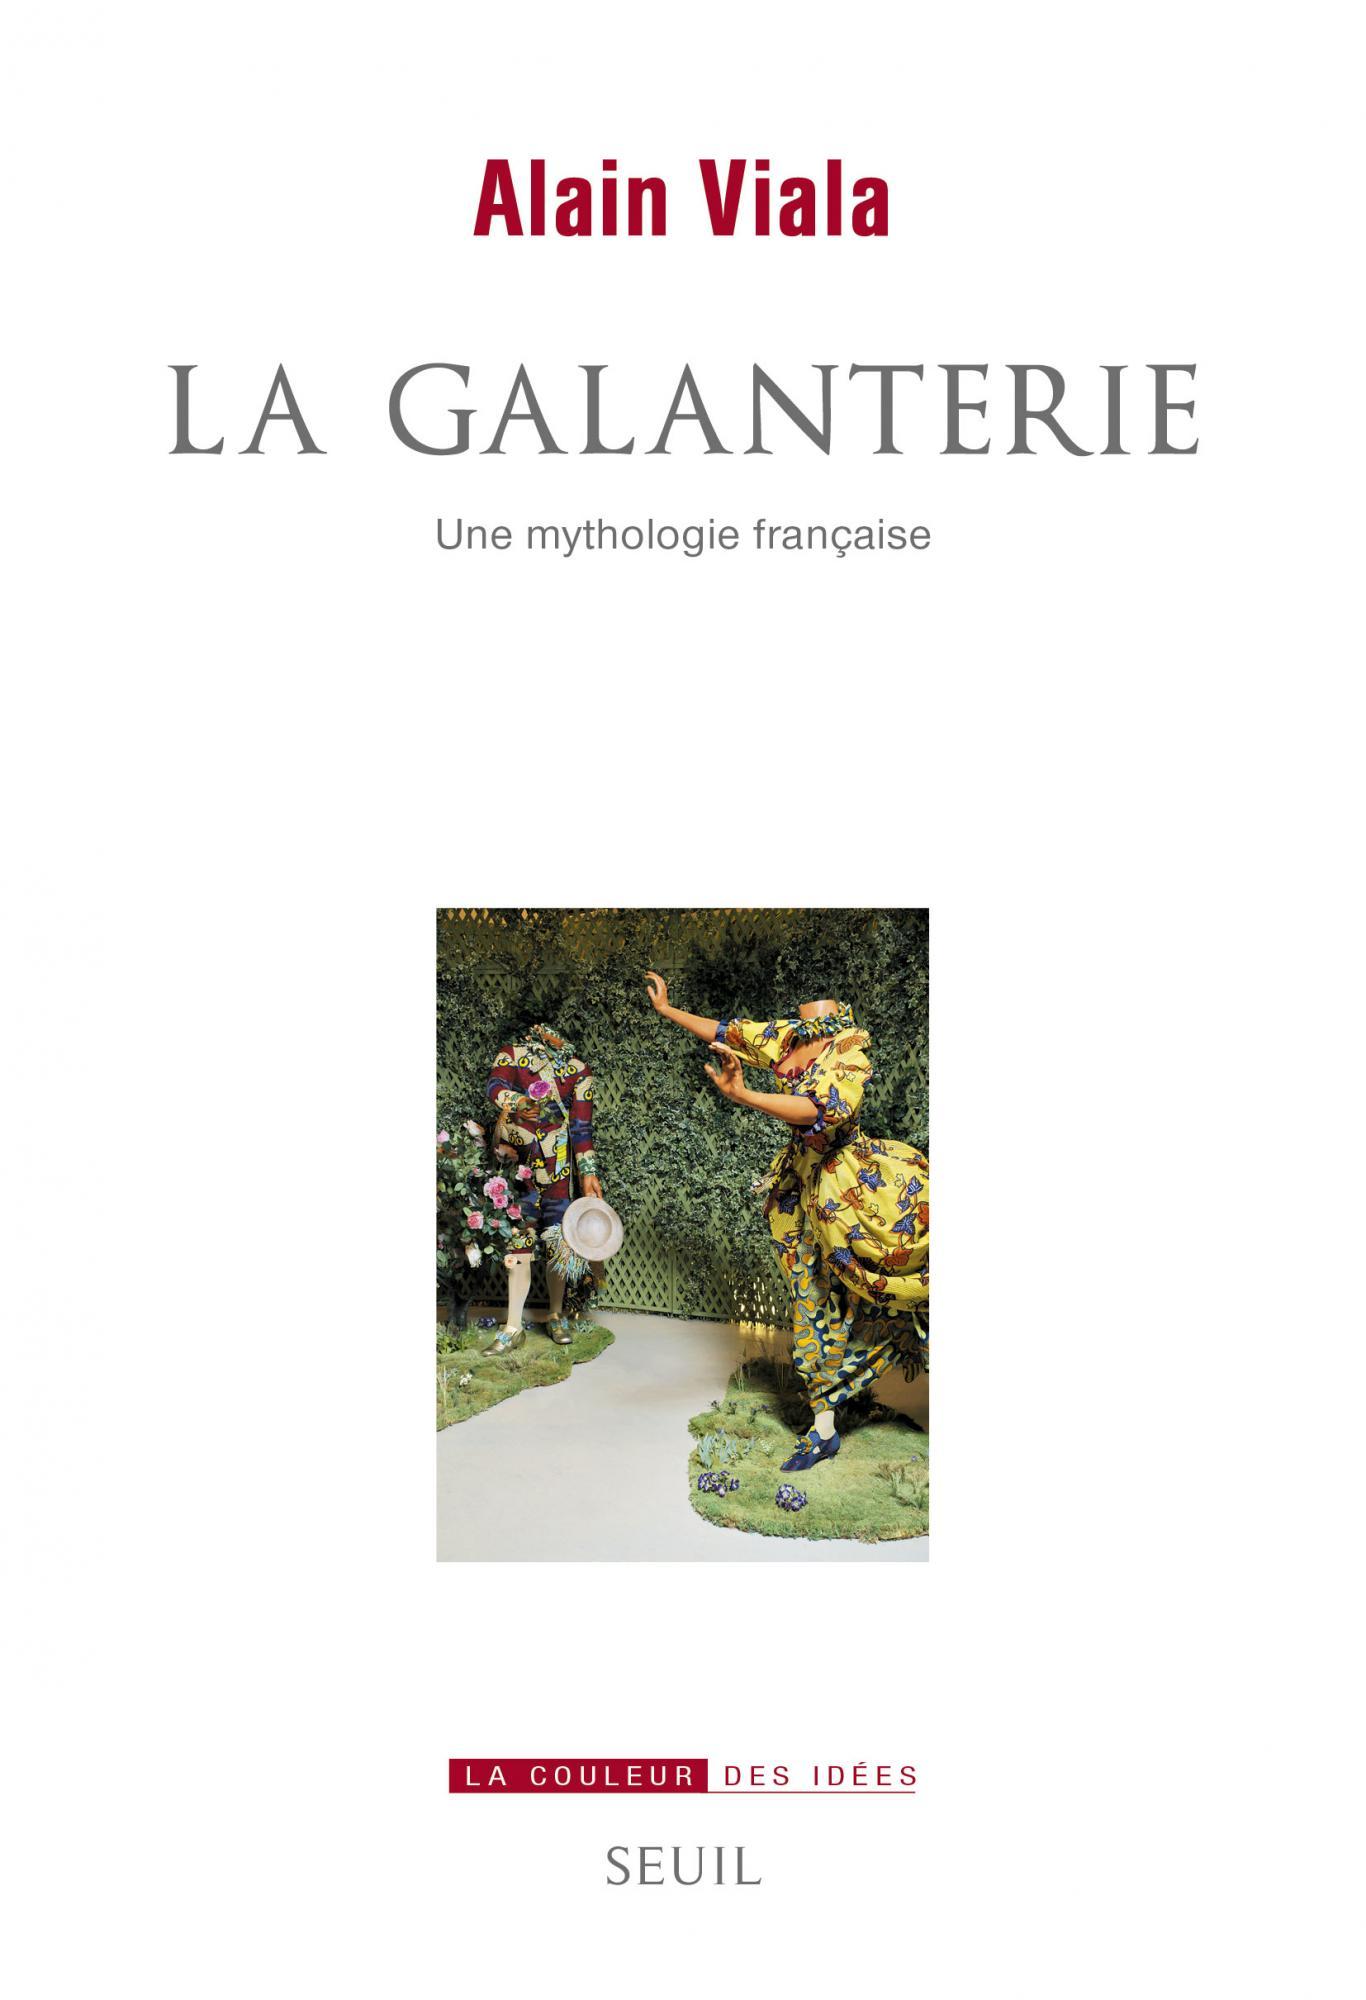 Une mythologie française